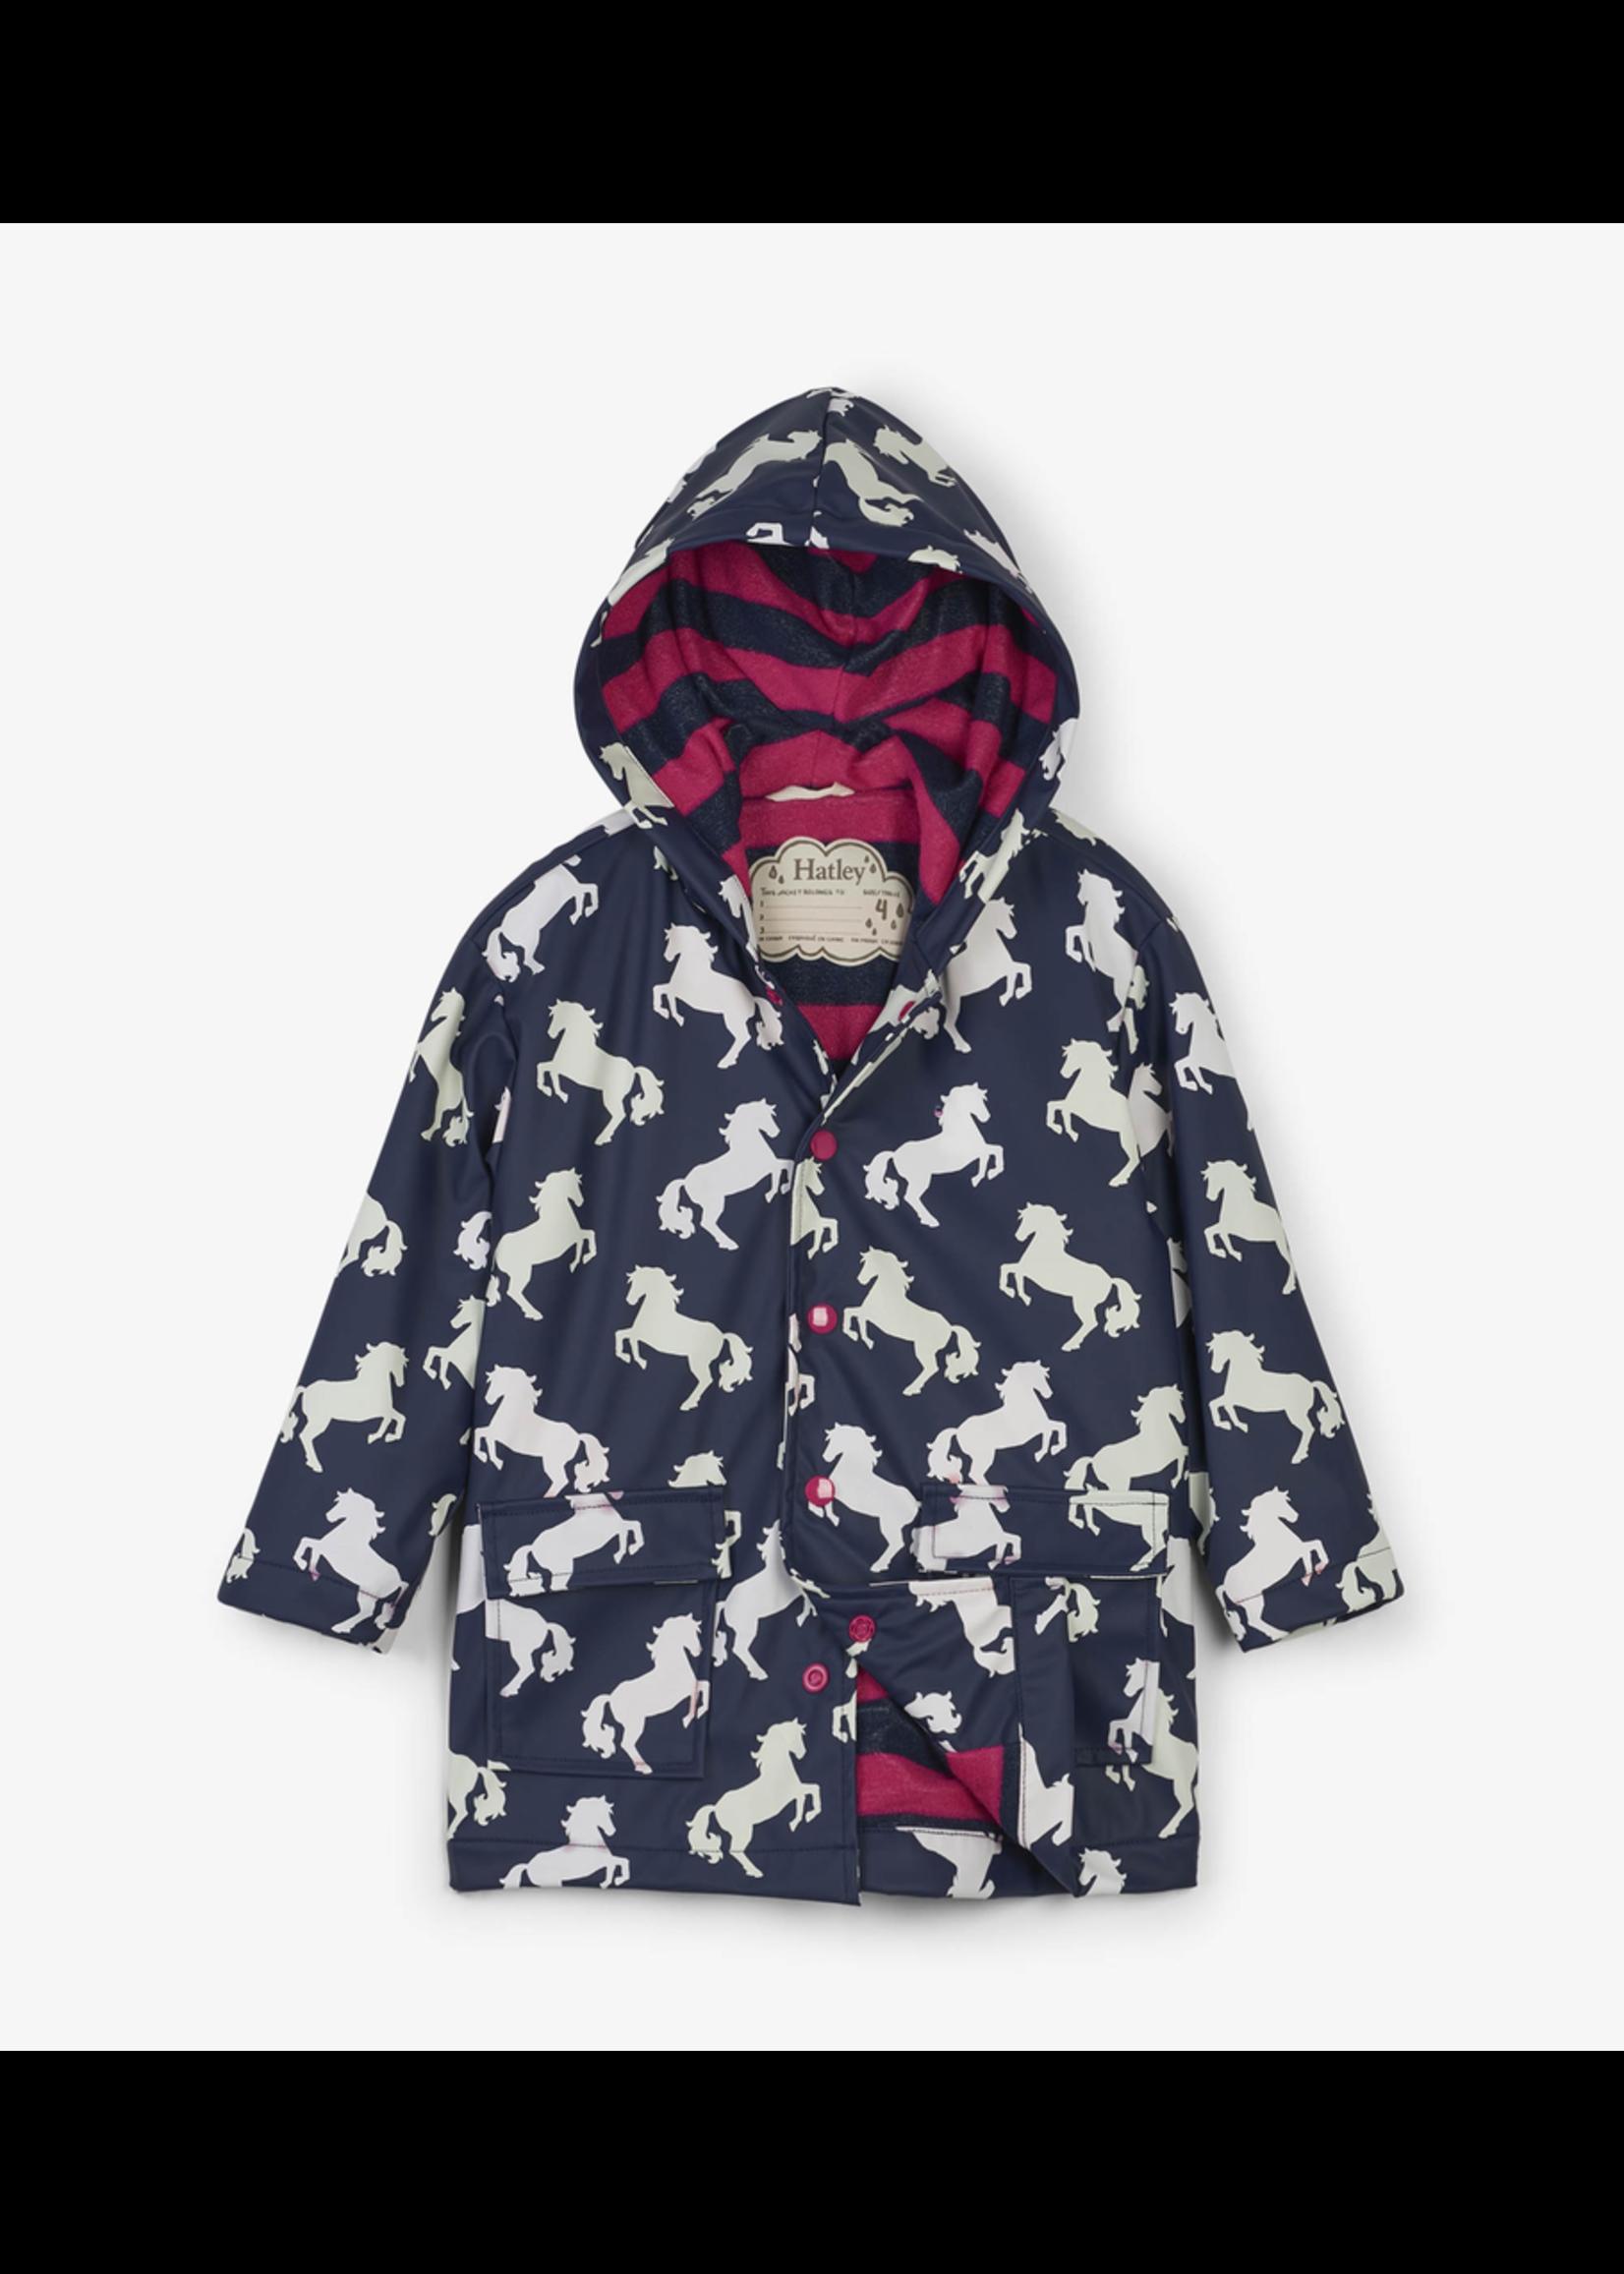 Hatley Hatley, Playful Horses Colour Changing Raincoat for Girl